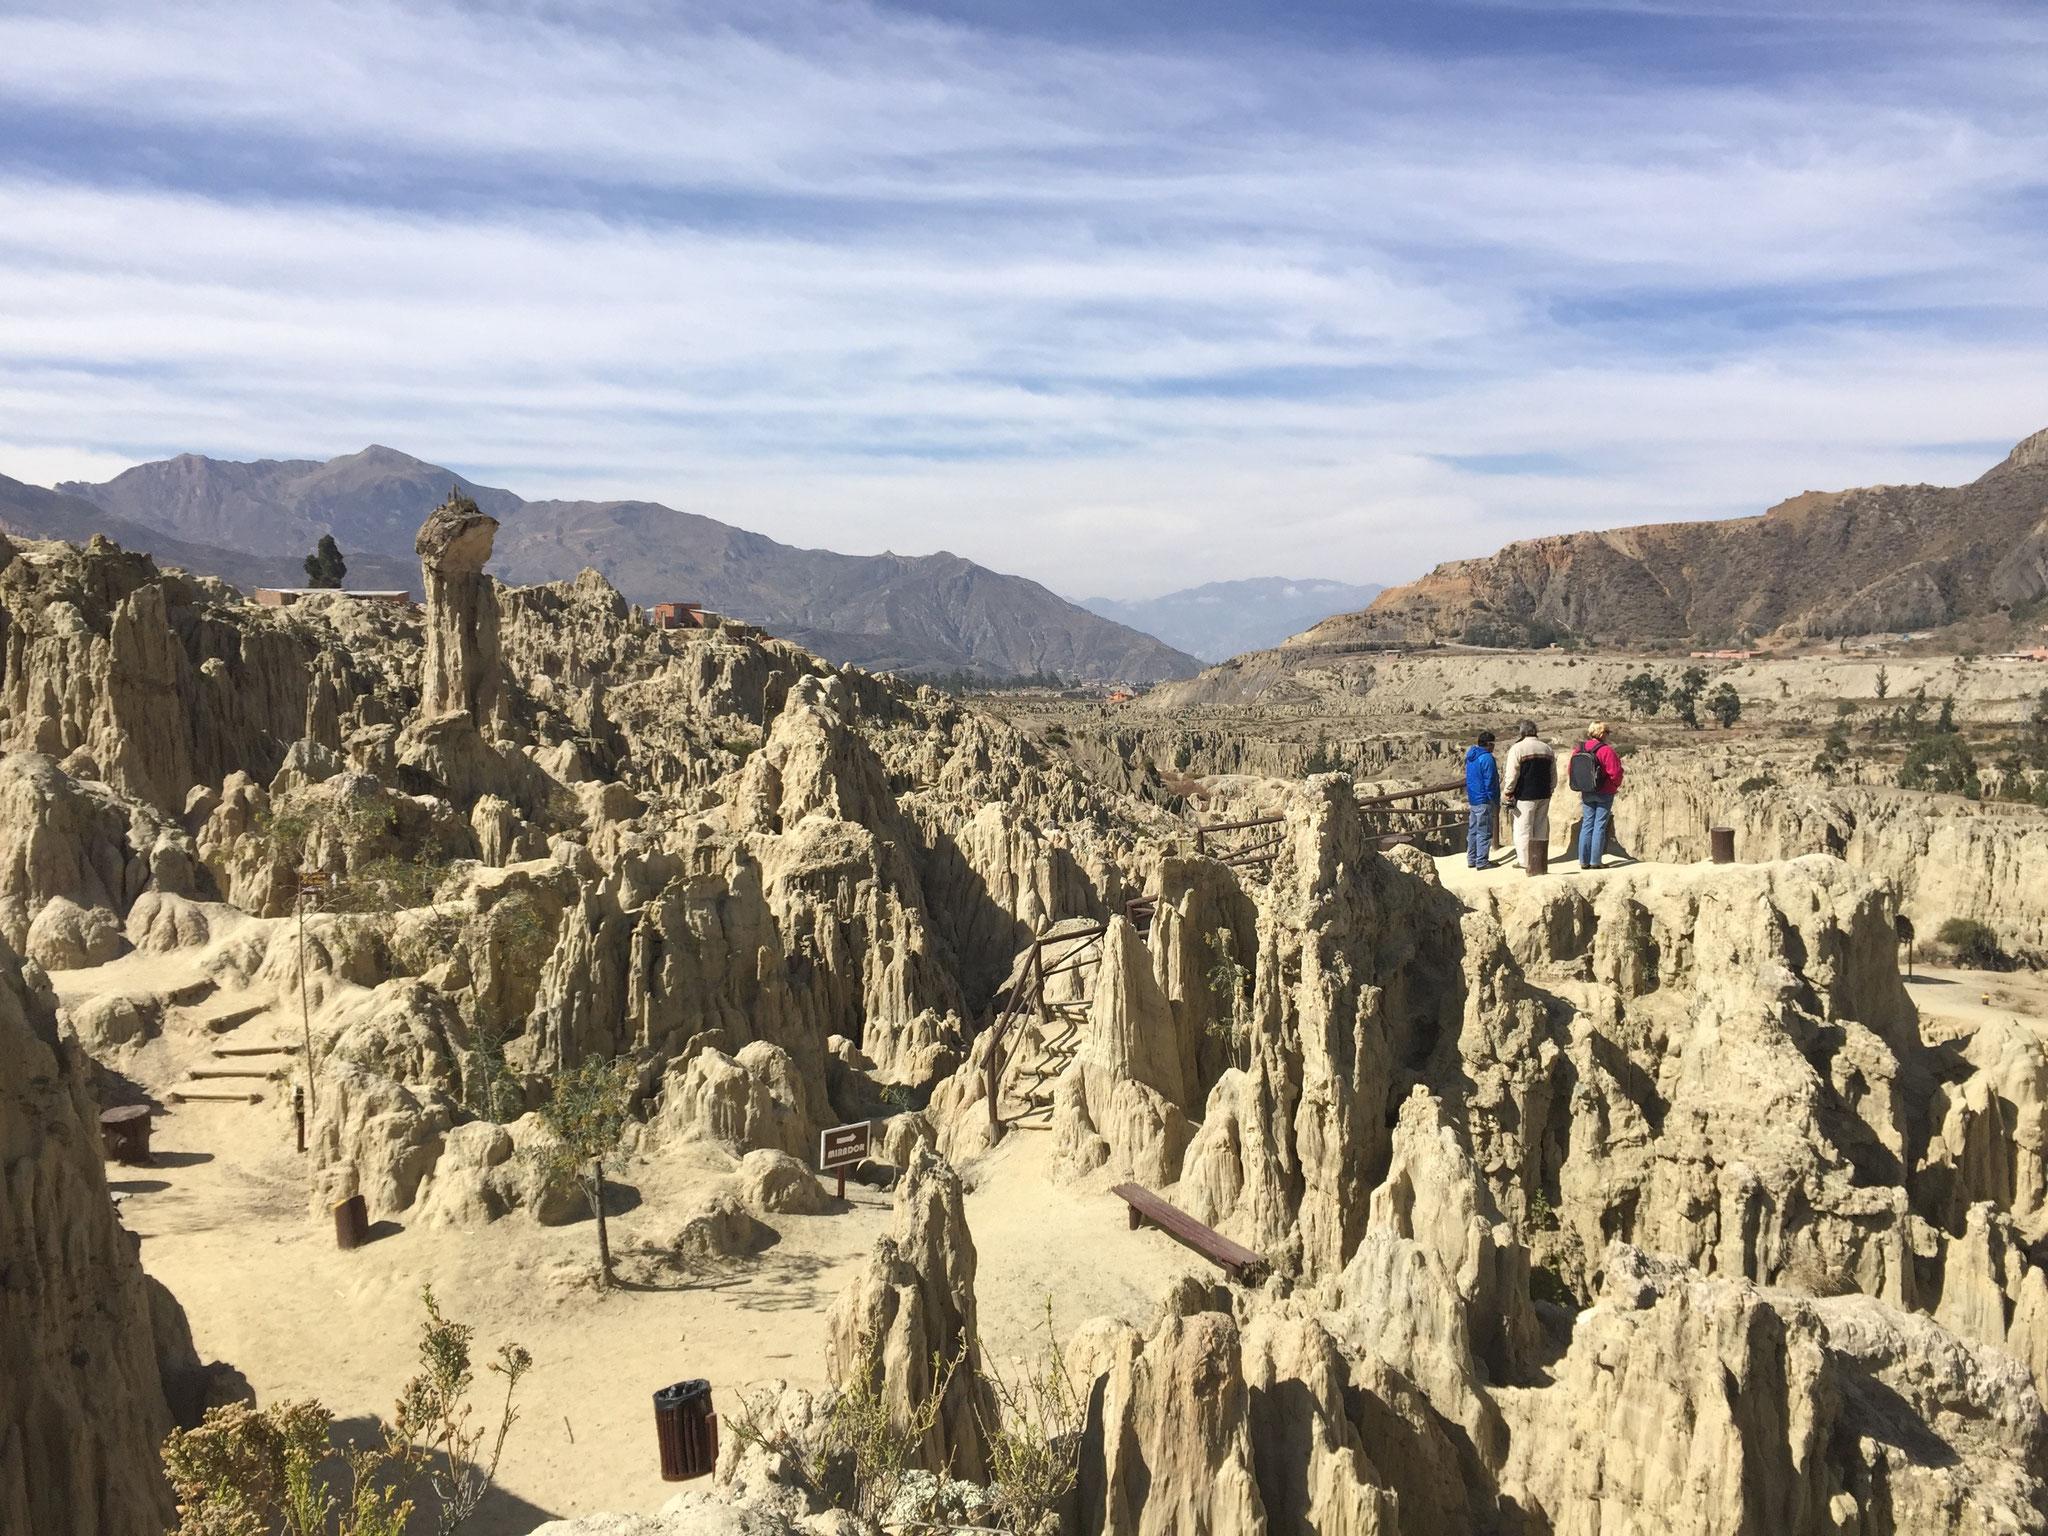 Valle de Luna in La Paz